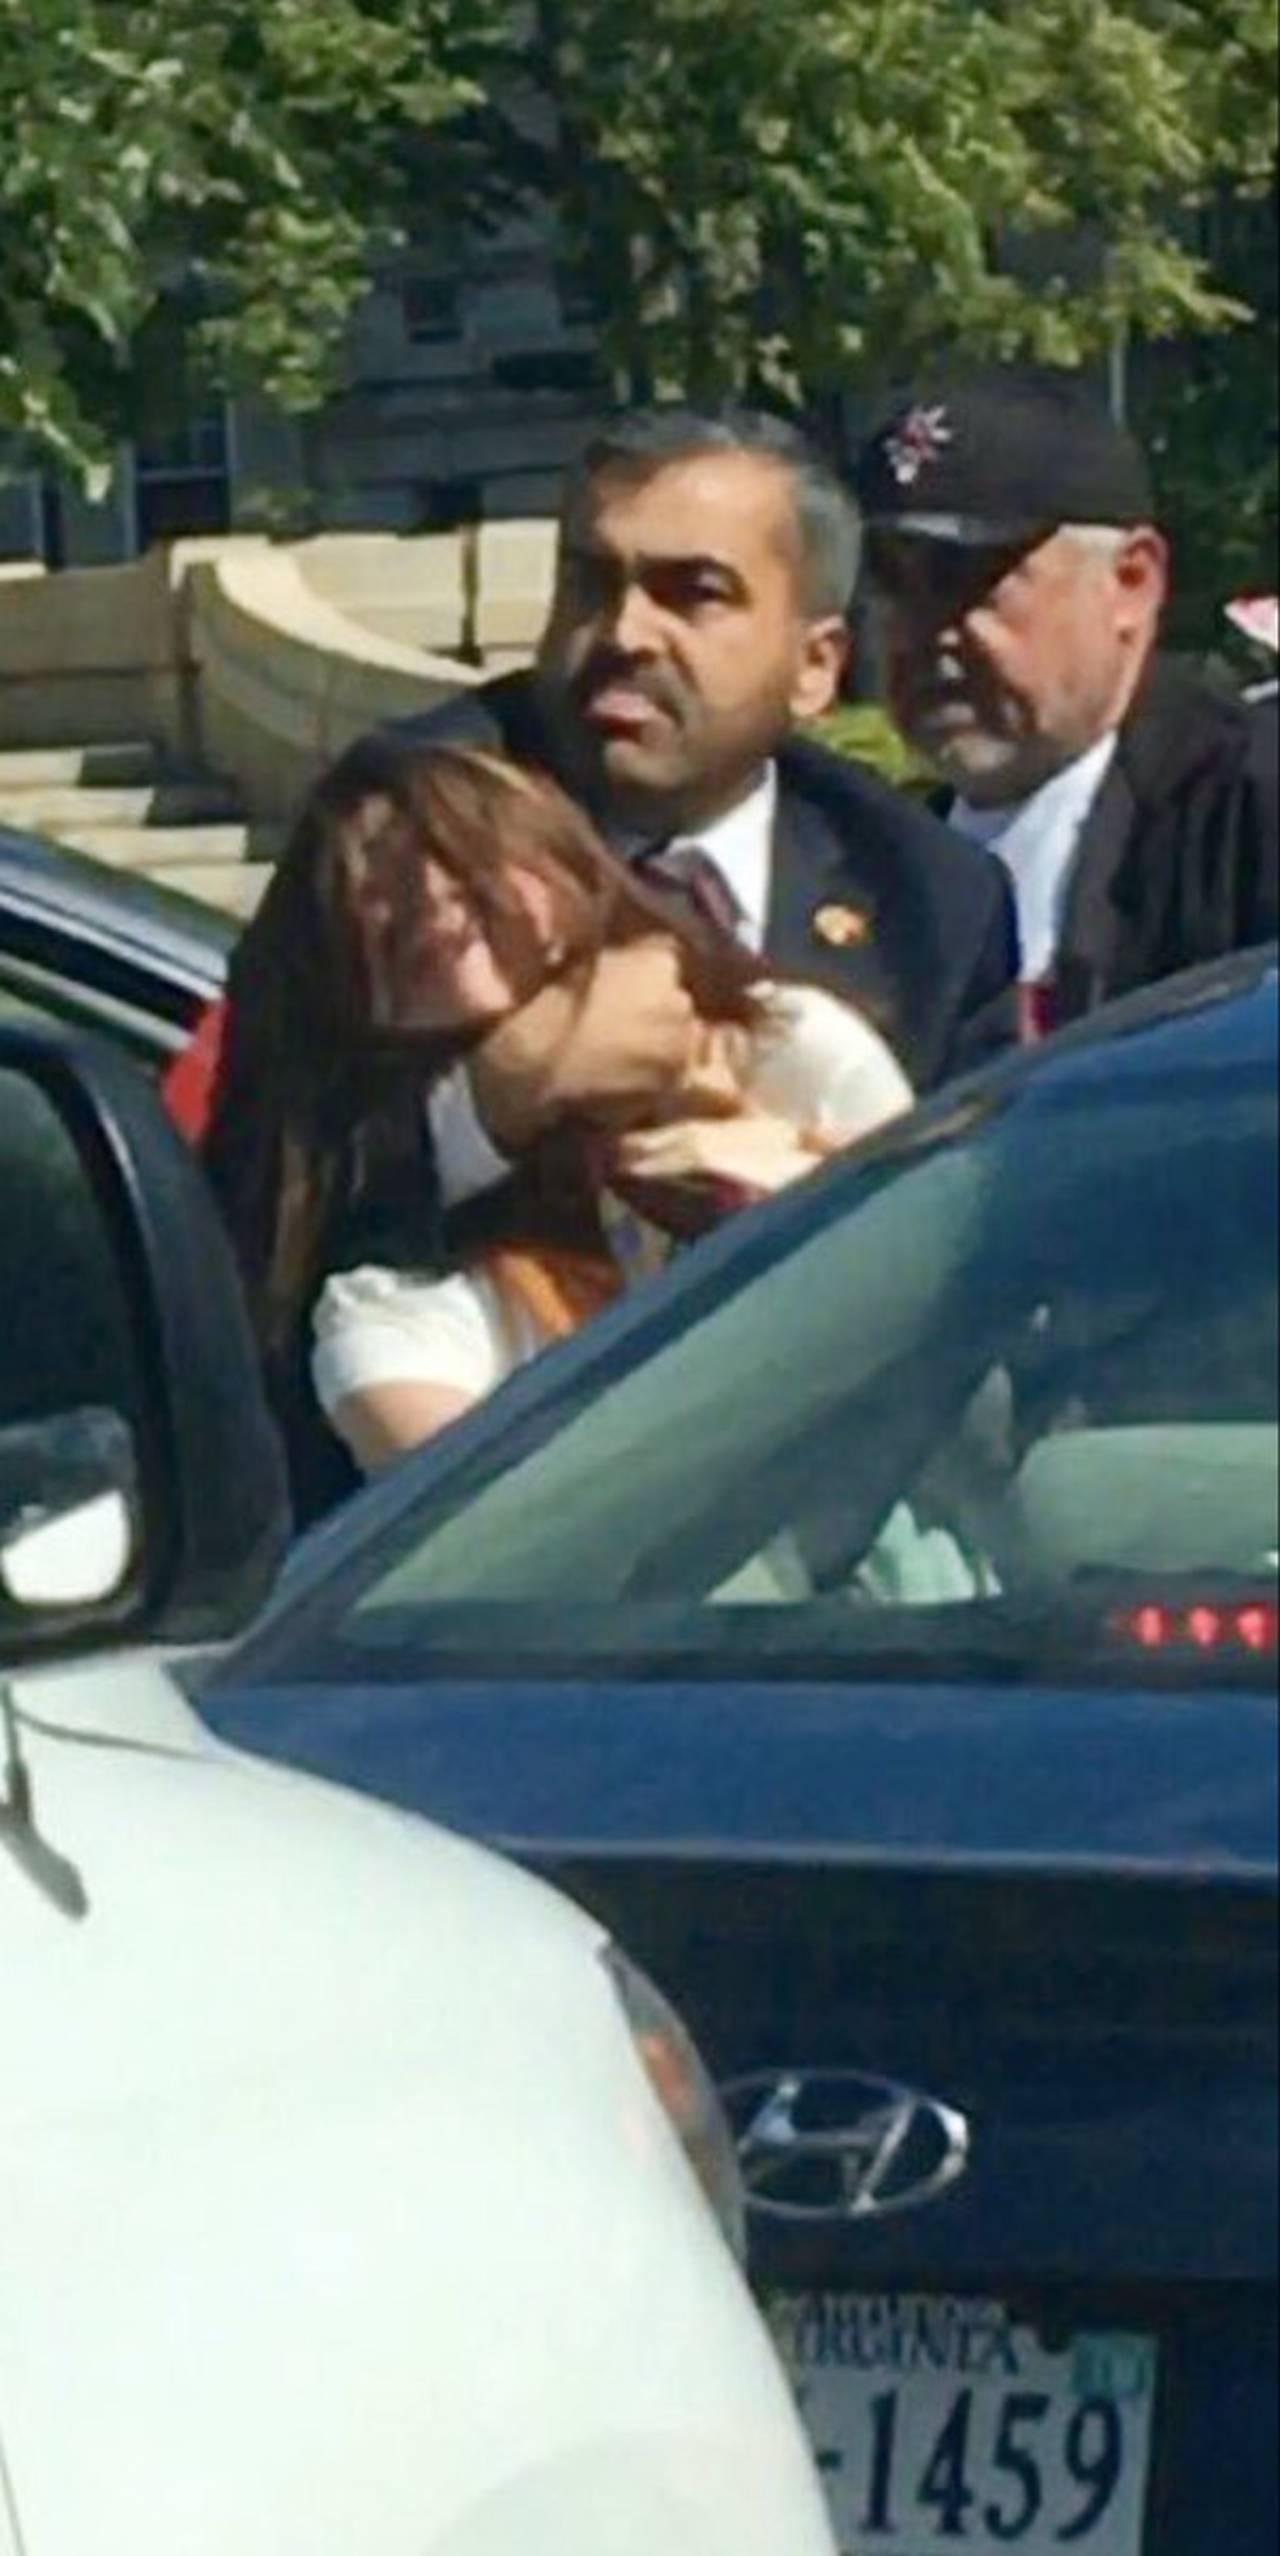 Lamentan lo ocurrido en embajada turca